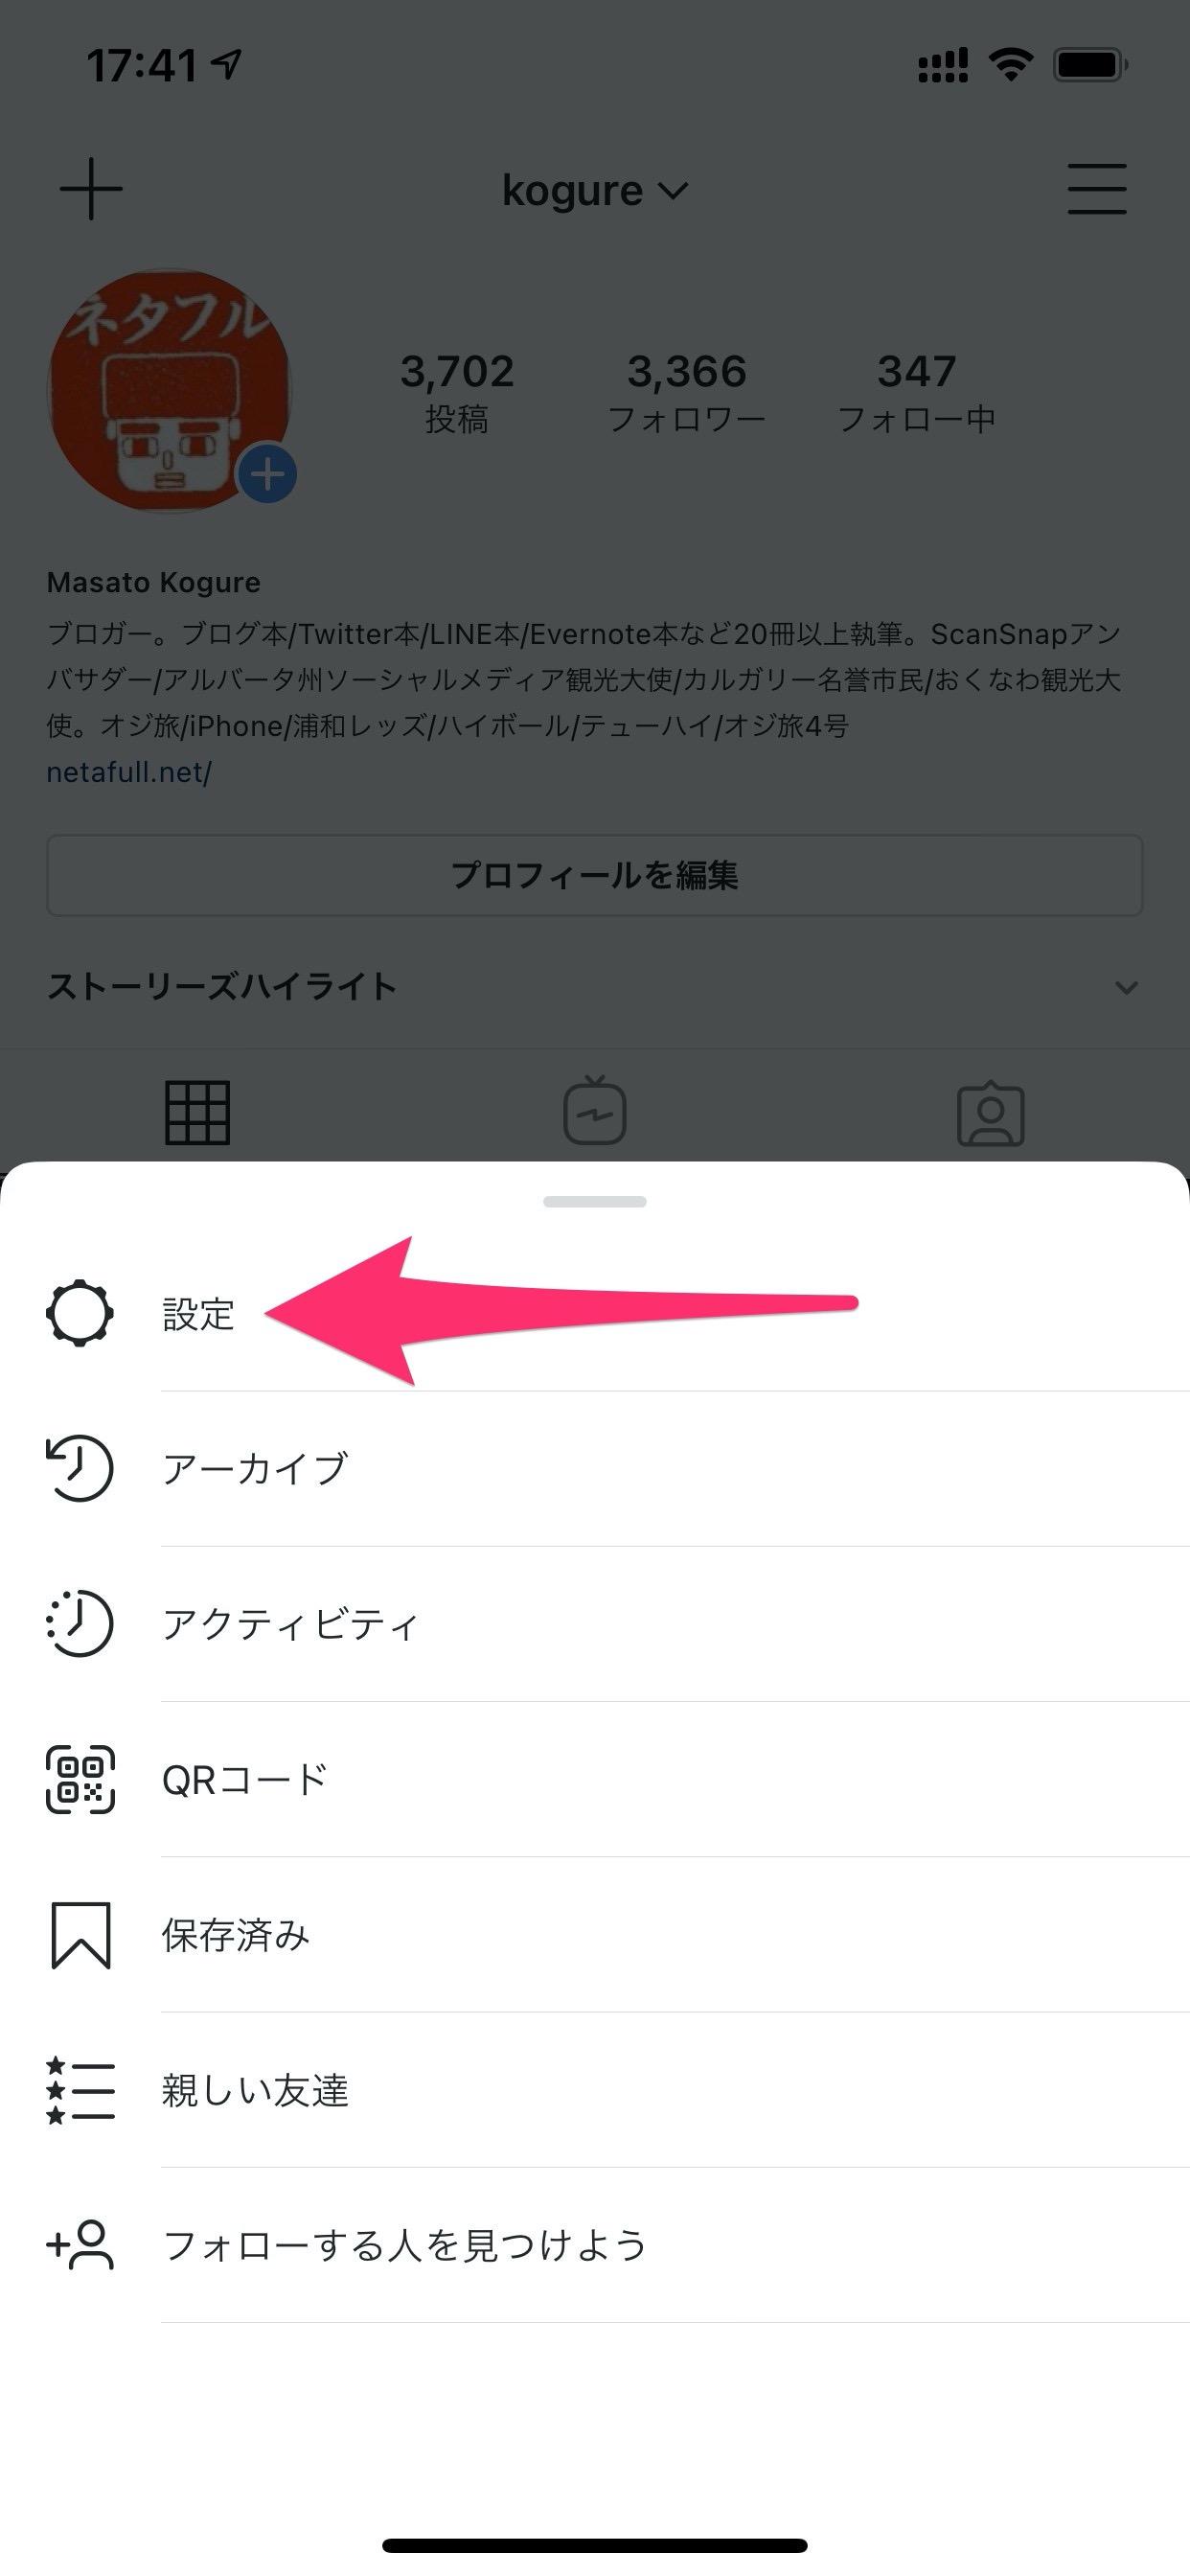 Instagramのアイコンを変更する方法 〜懐かしい昔のアイコンにも変更できる!